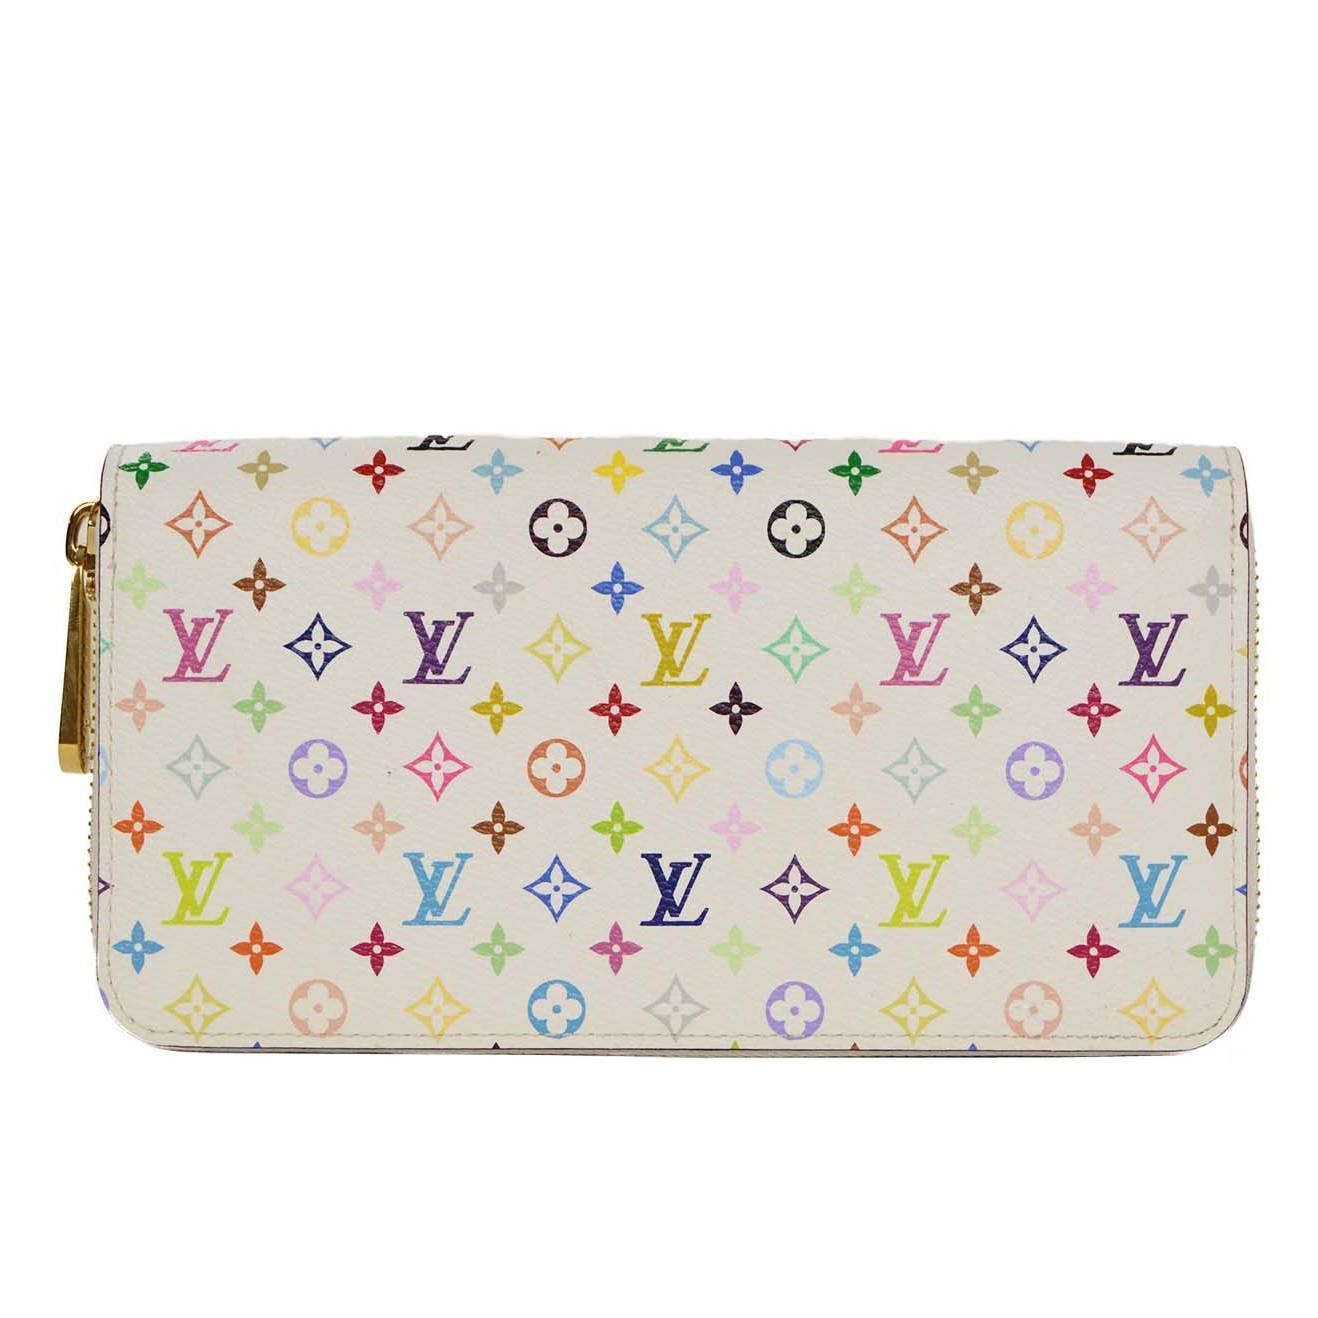 Louis Vuitton White And Multi Color Monogram Zippy Wallet